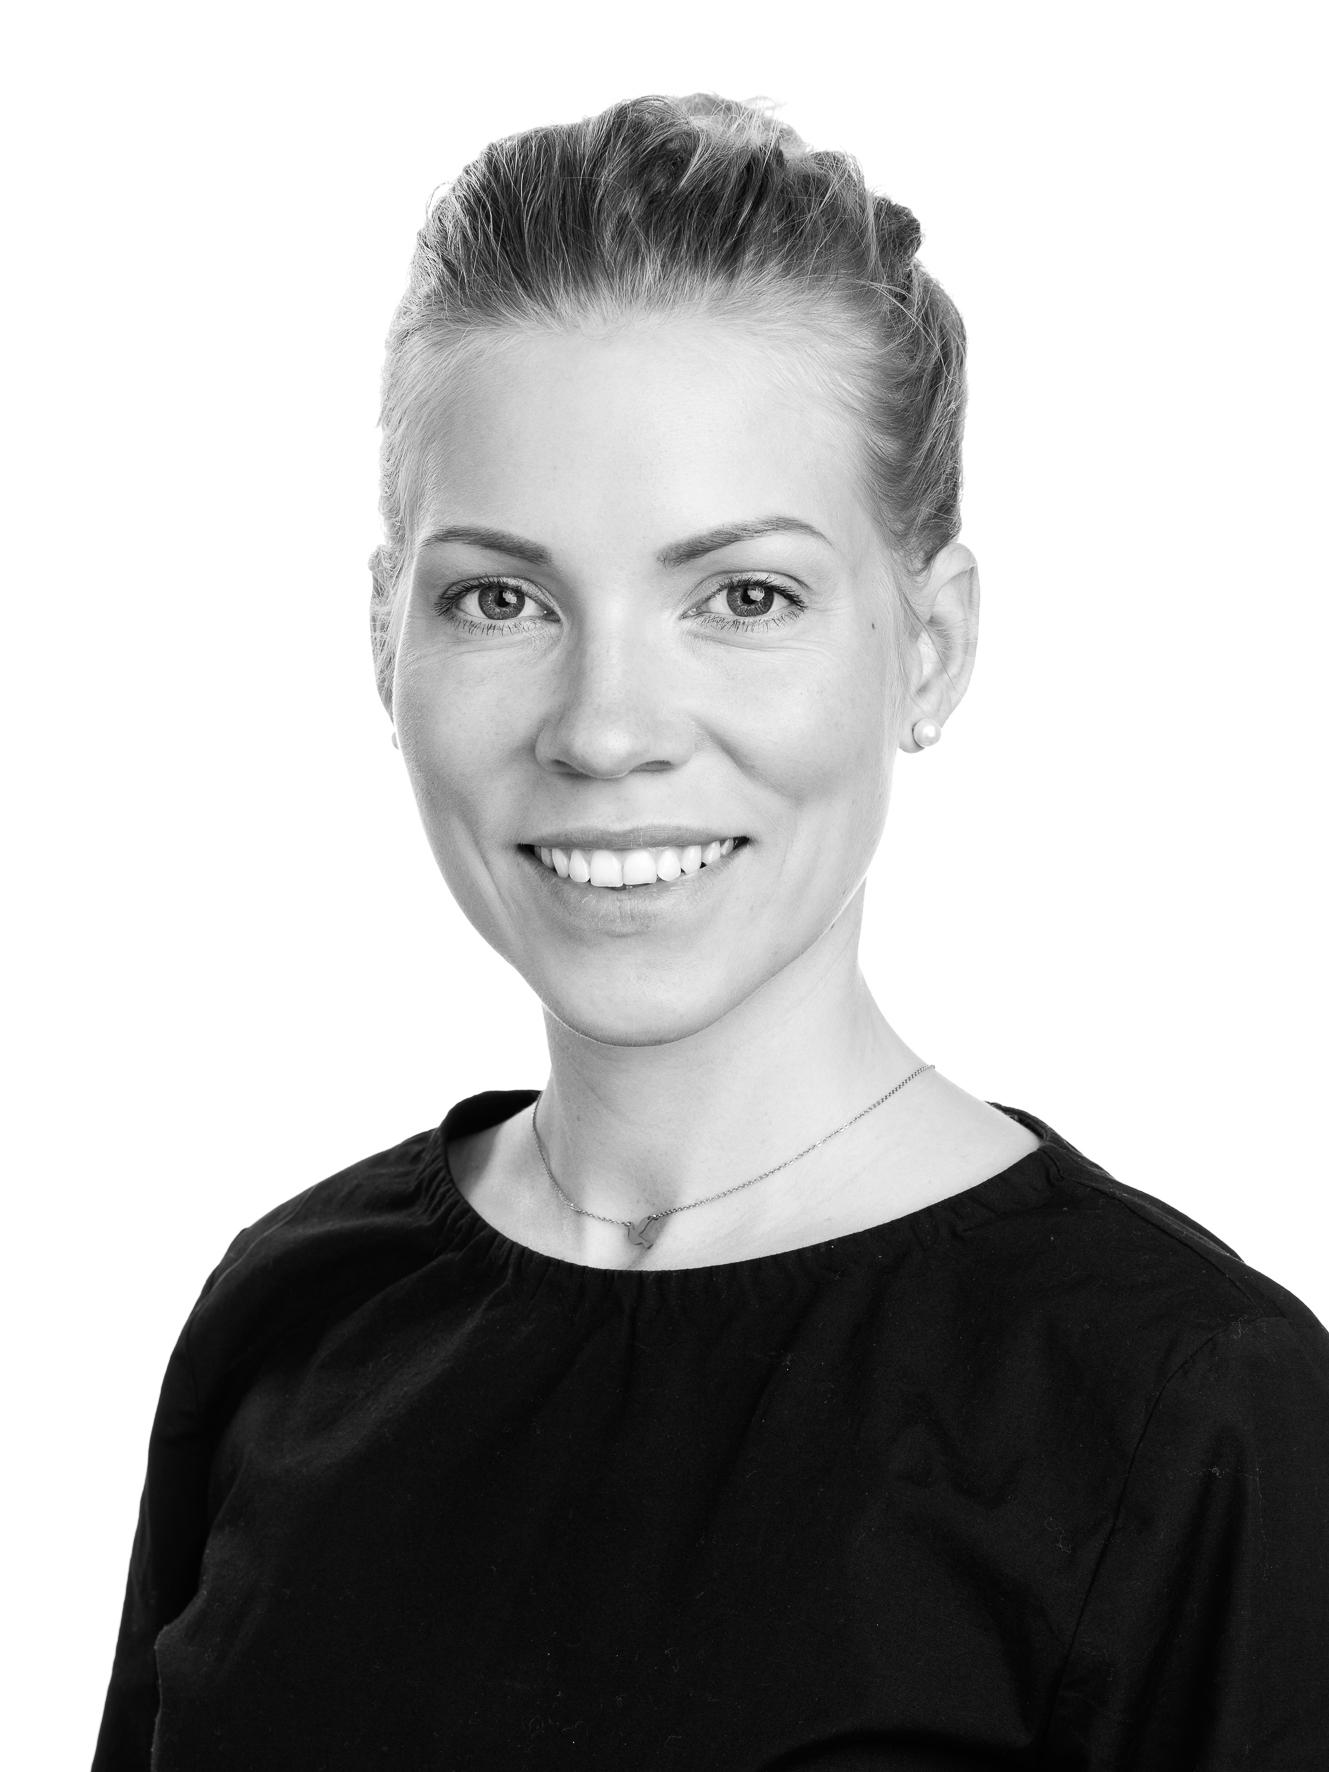 31777 Klinik 34 Jonna Gibbings 2017-05-16-9-Redigera